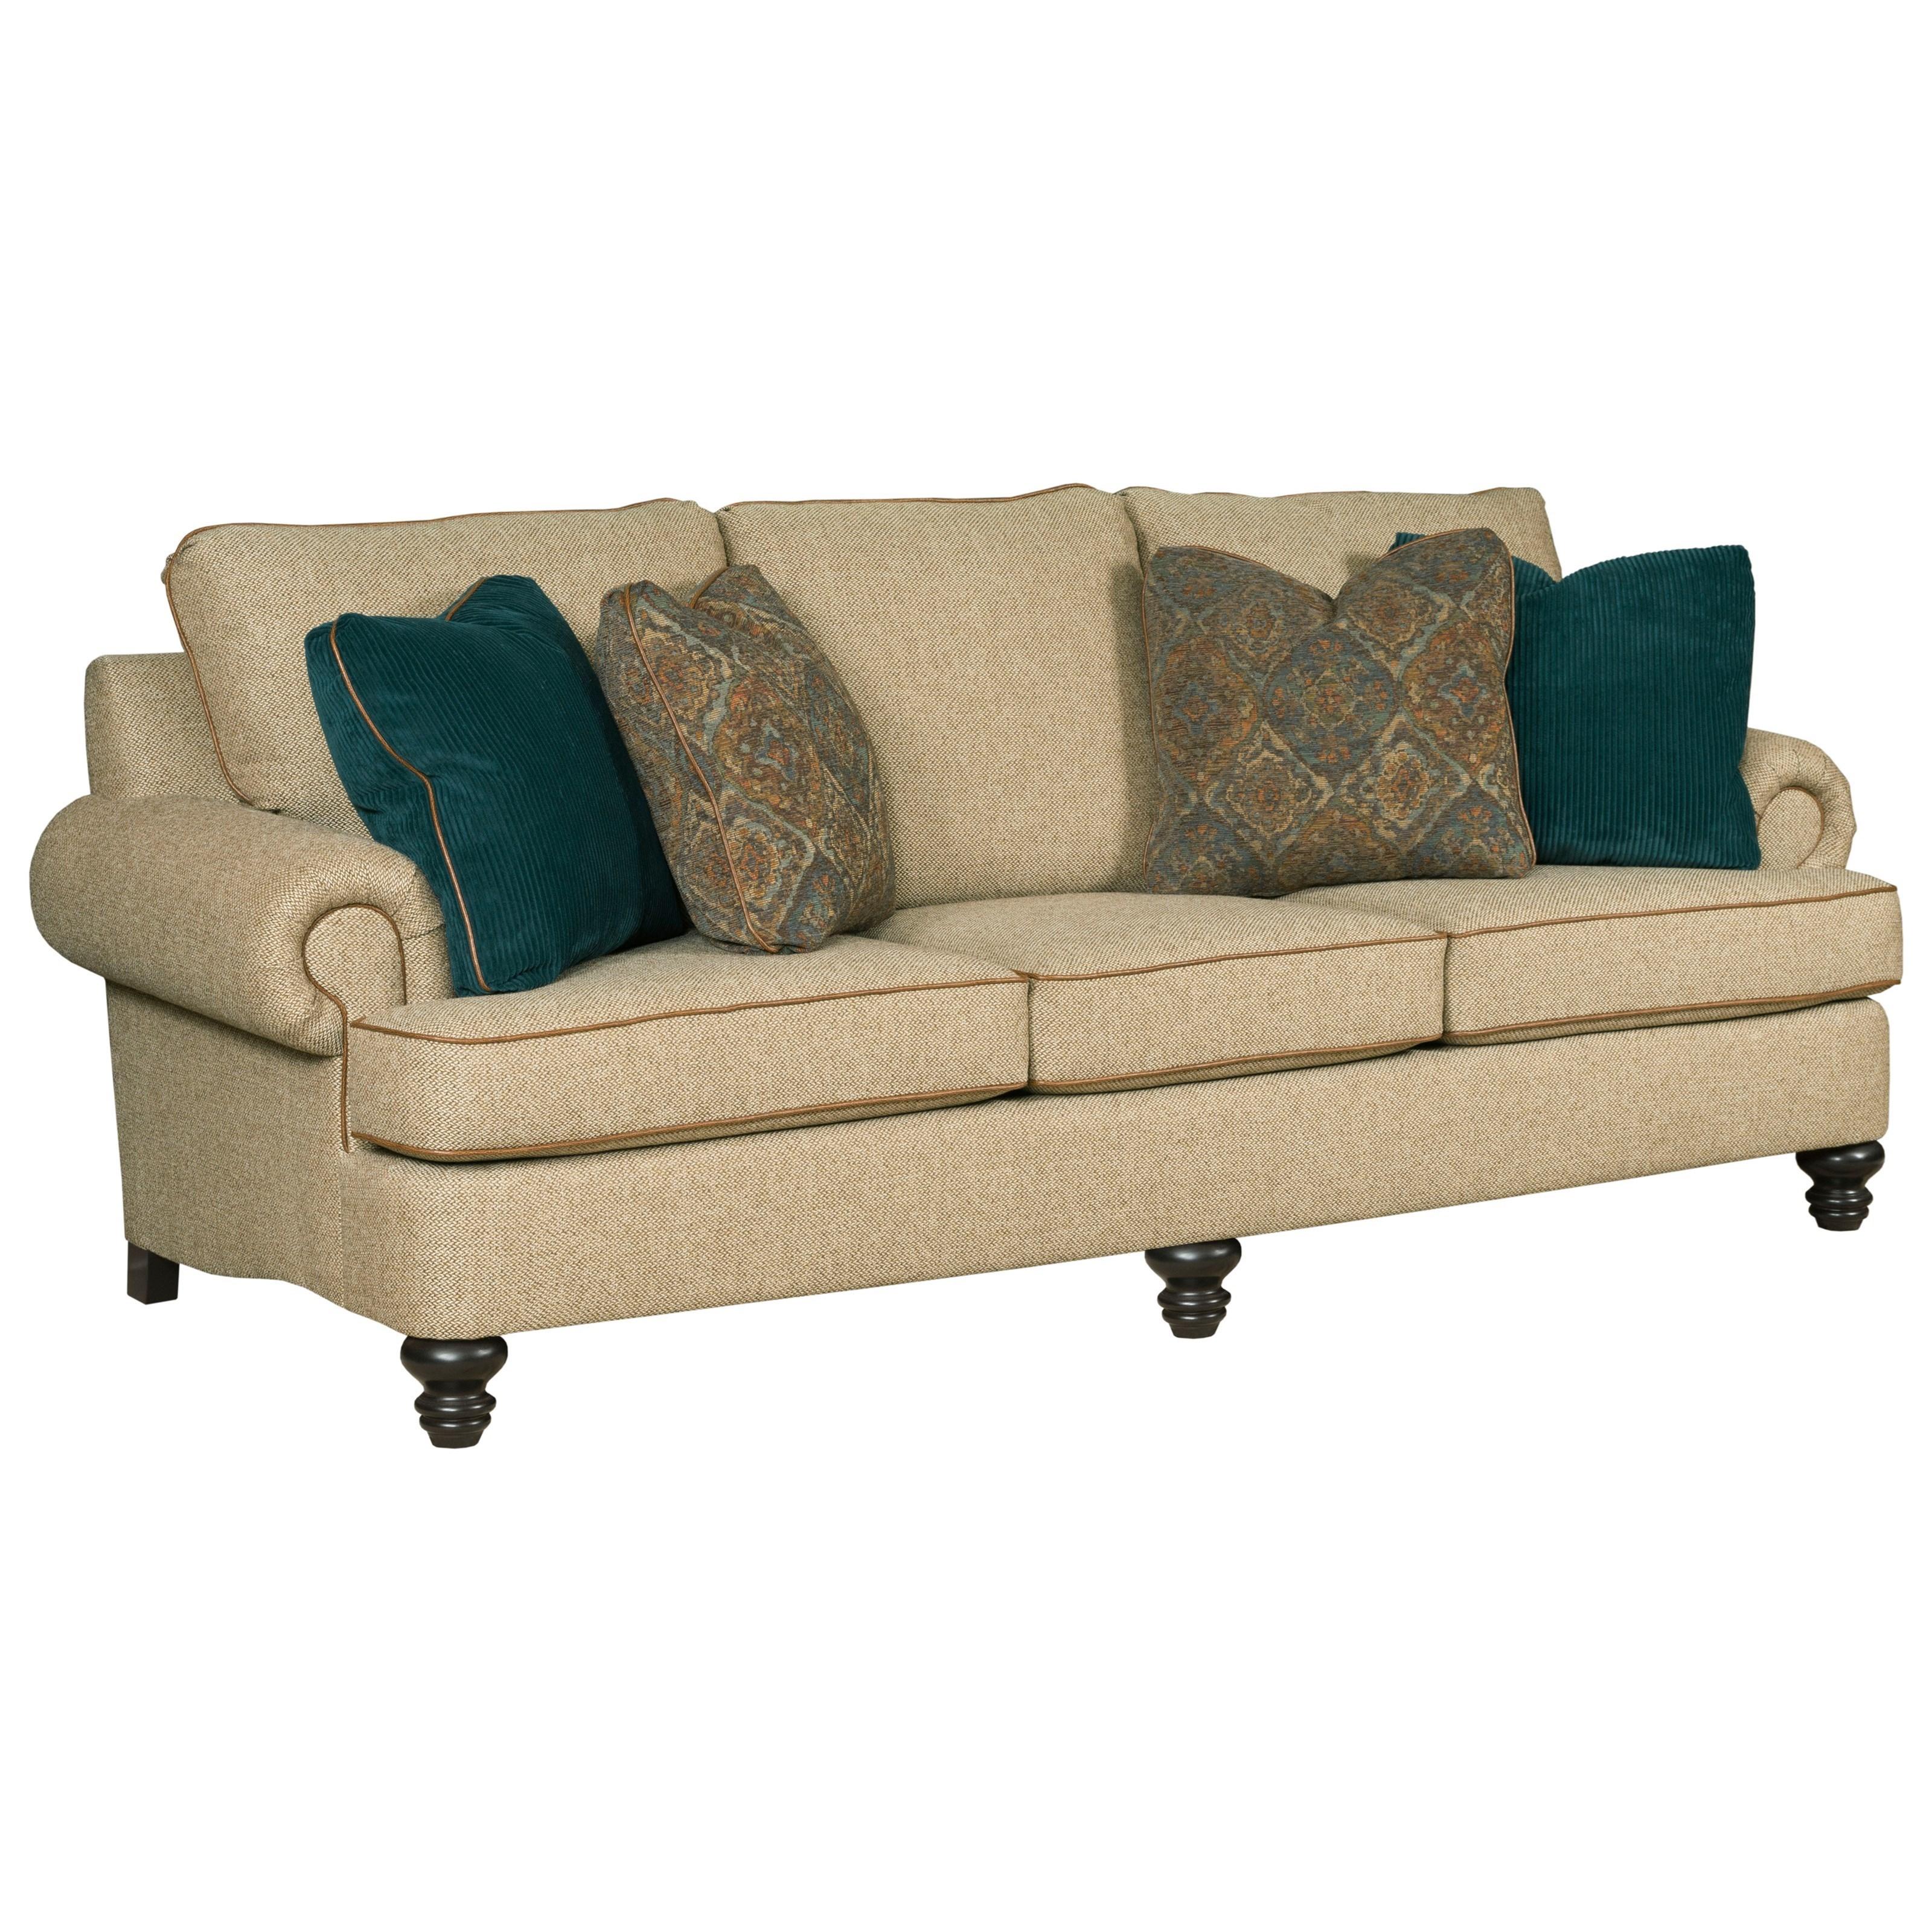 Avery Grand Sofa by Kincaid Furniture at Johnny Janosik